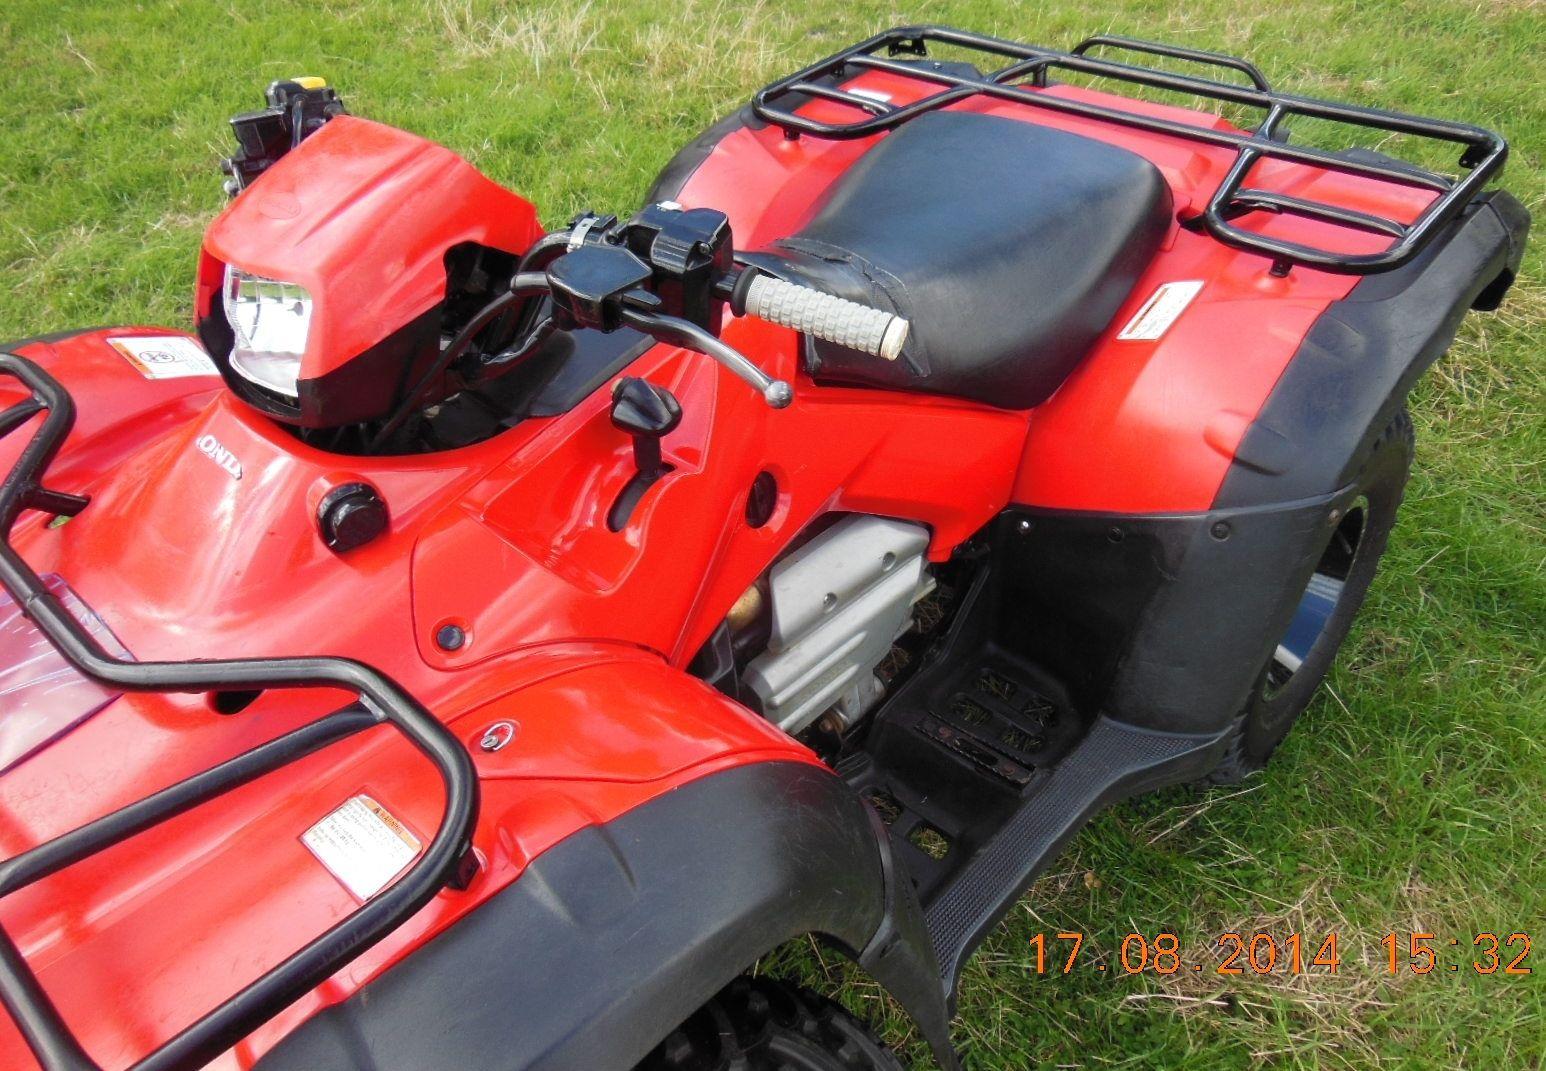 Honda Foreman 500fa Automatic Quad Bike Off Road 4x4 Utility Farm Quad Atv